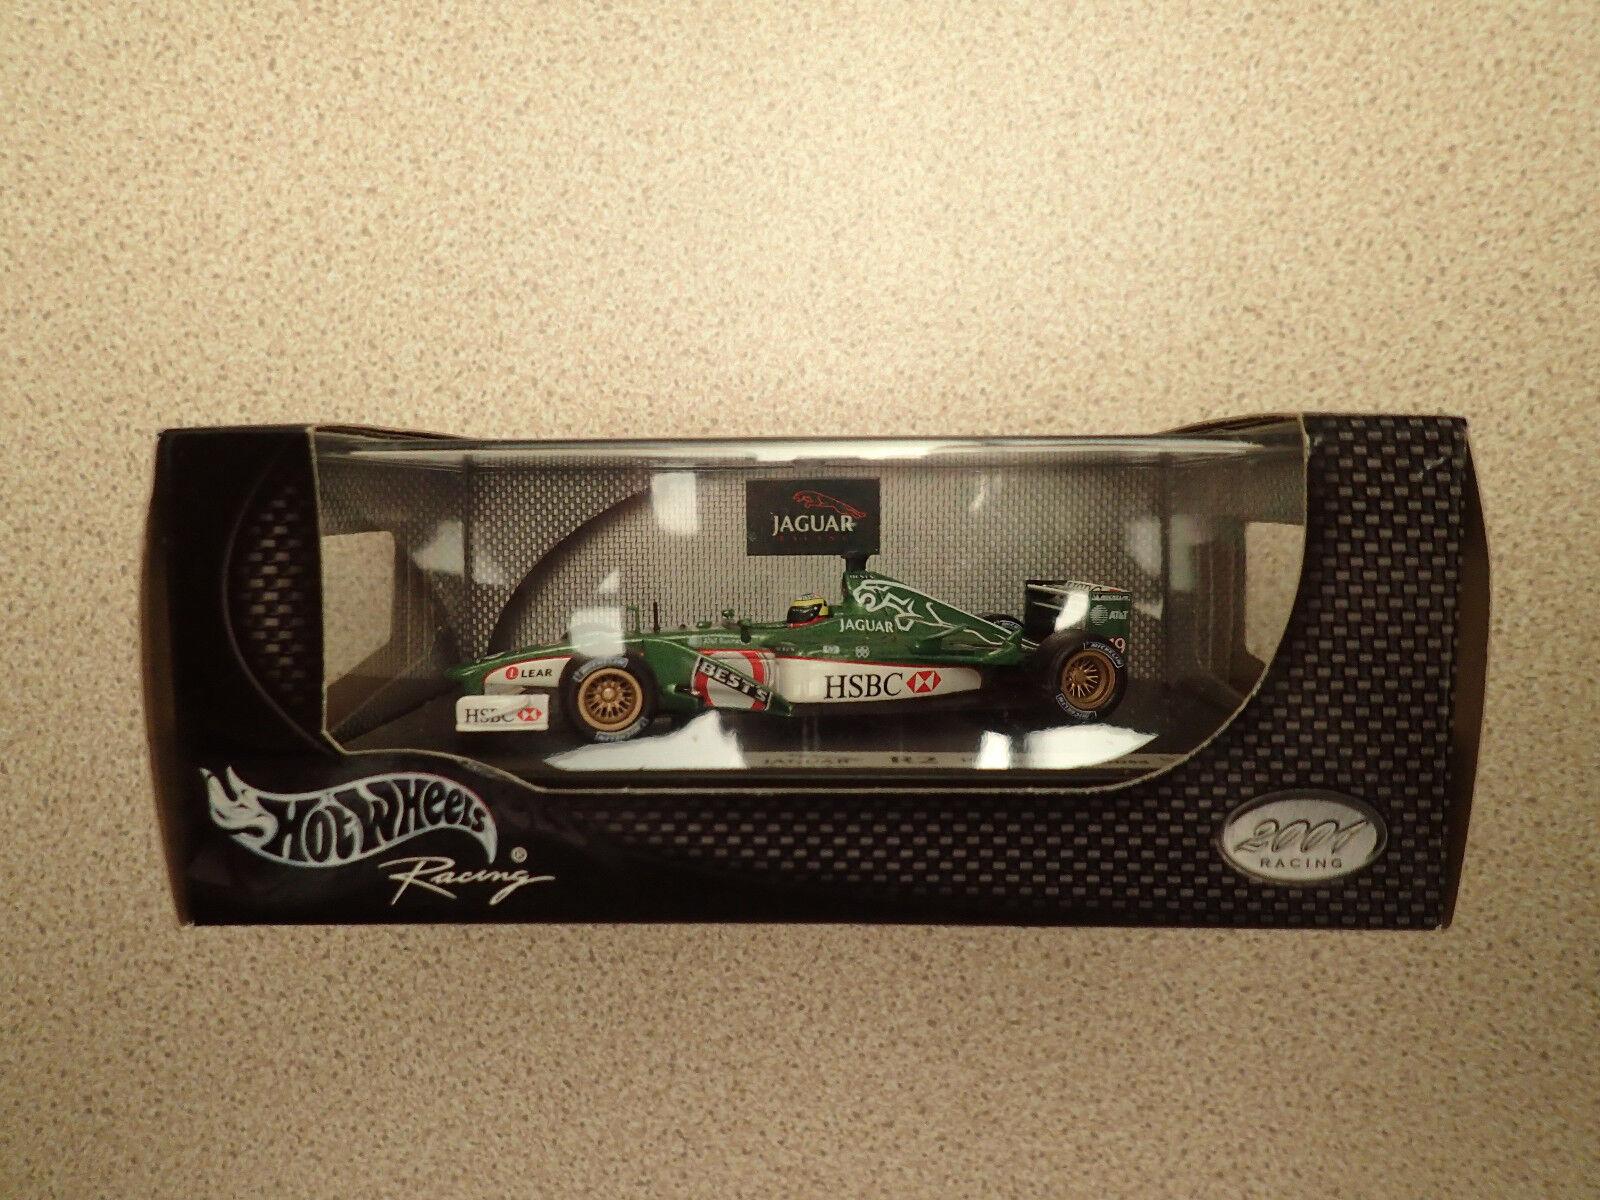 Hot Wheels Racing 2001 1 43 50206 Jaguar R2 Pedro De La pink Sealed Untouched